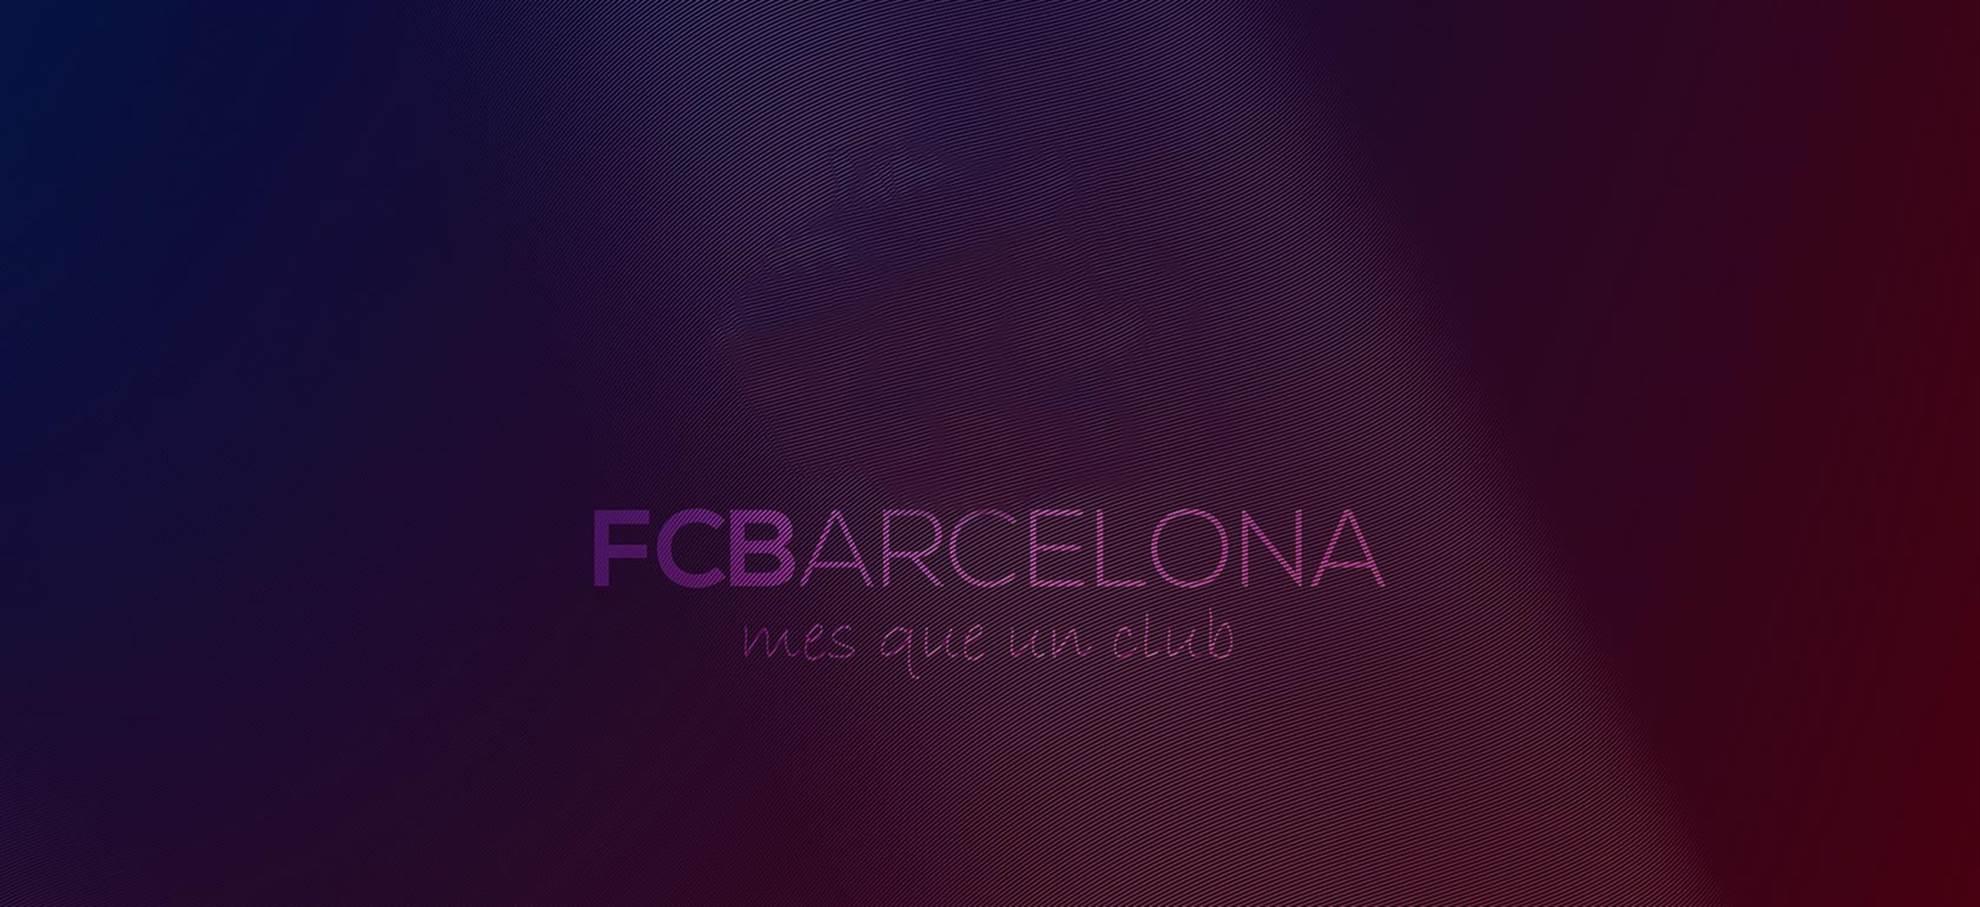 FC Barcelona - Atlético de Madrid (06-04-2019)